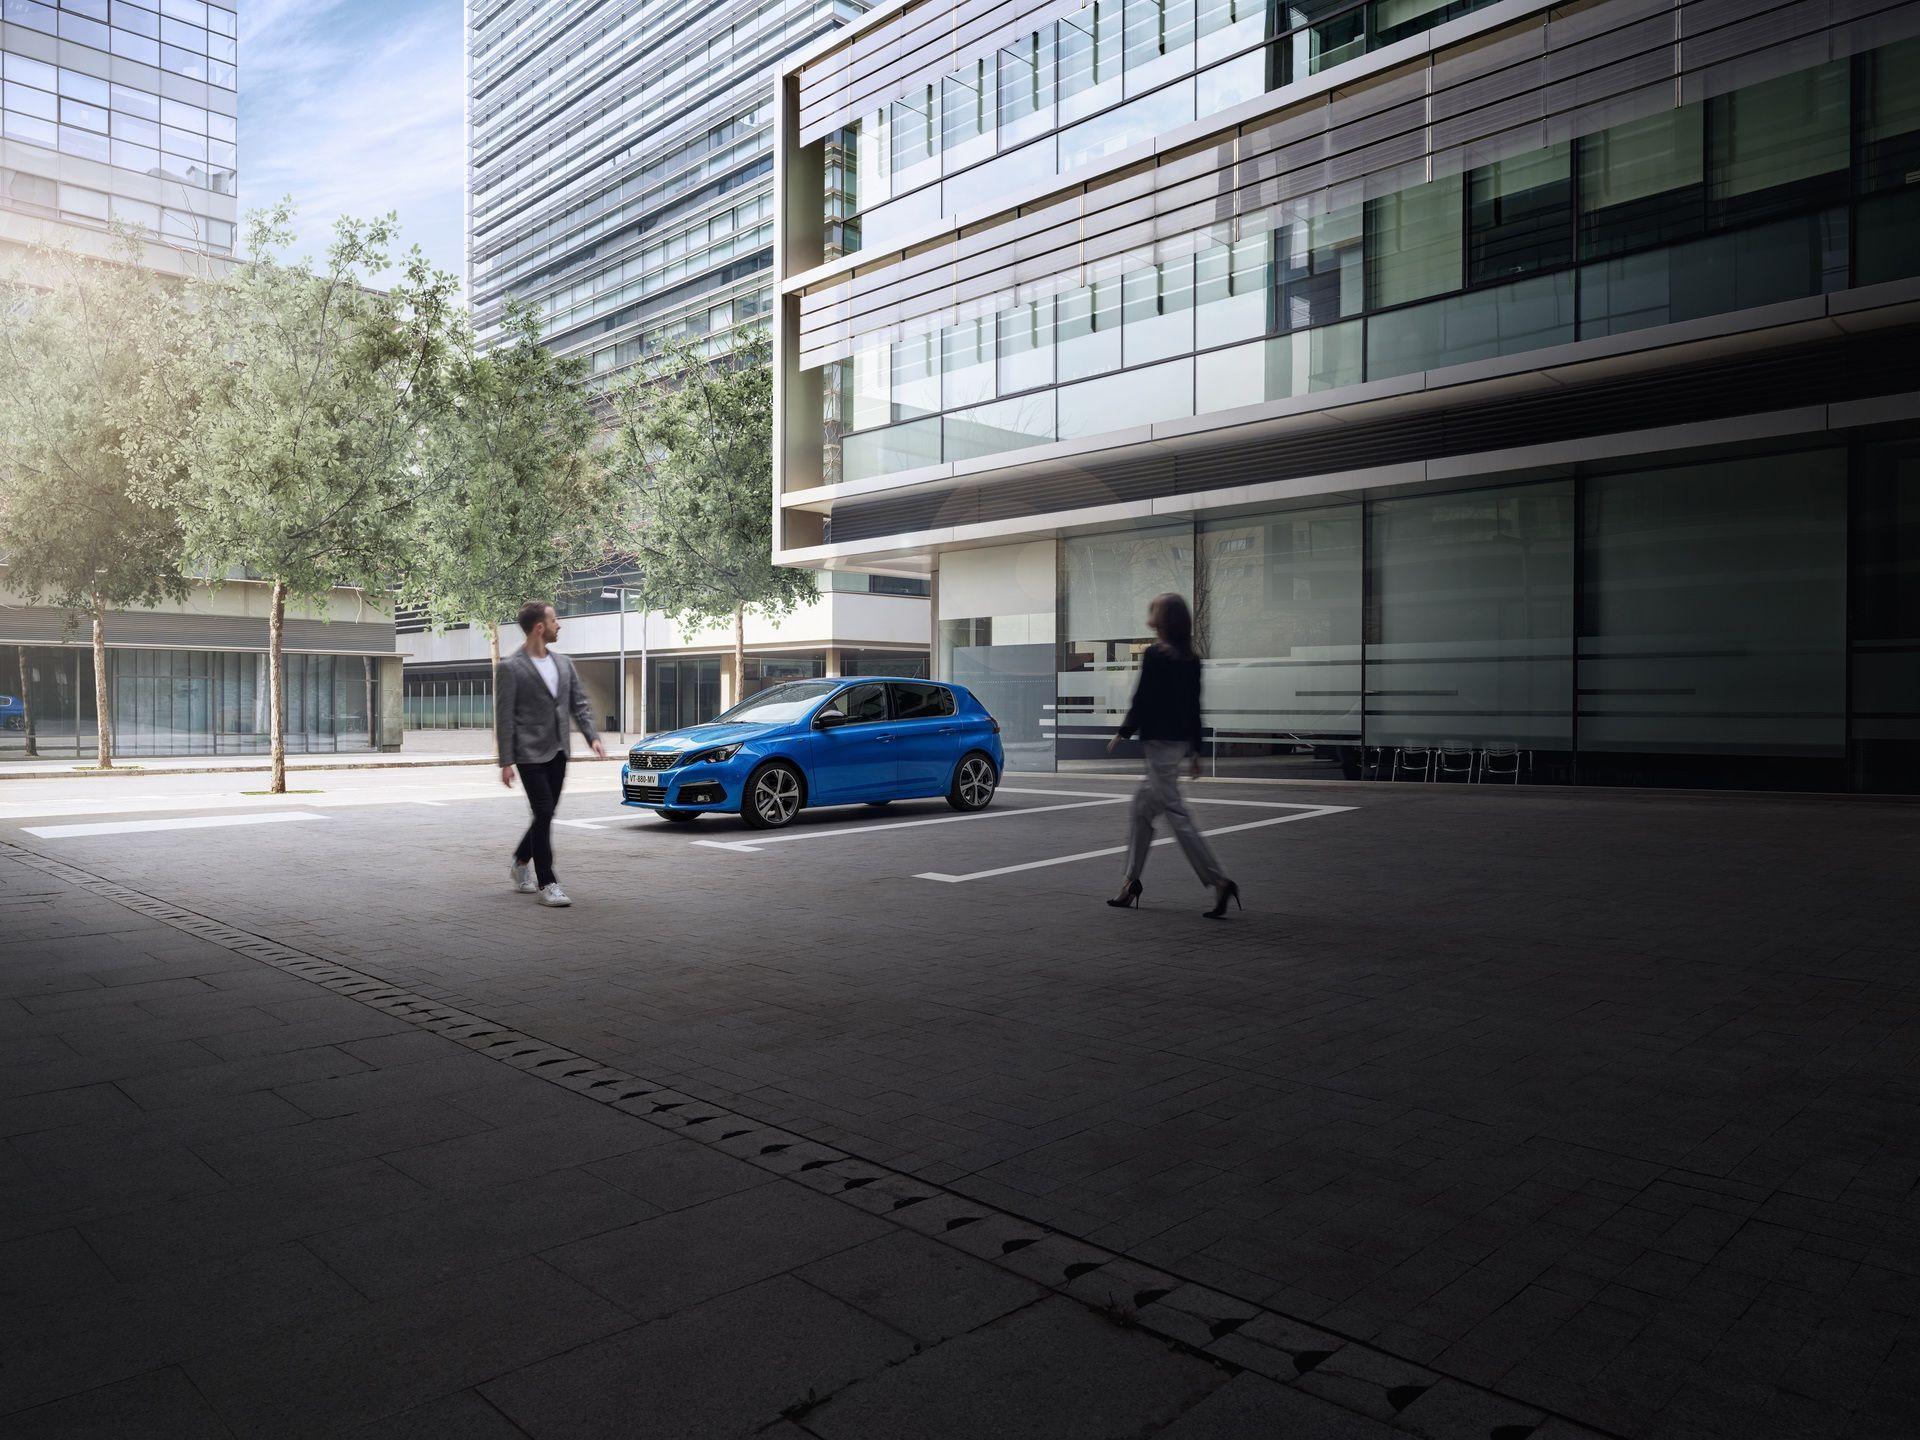 2020_Peugeot_308_facelift_0002